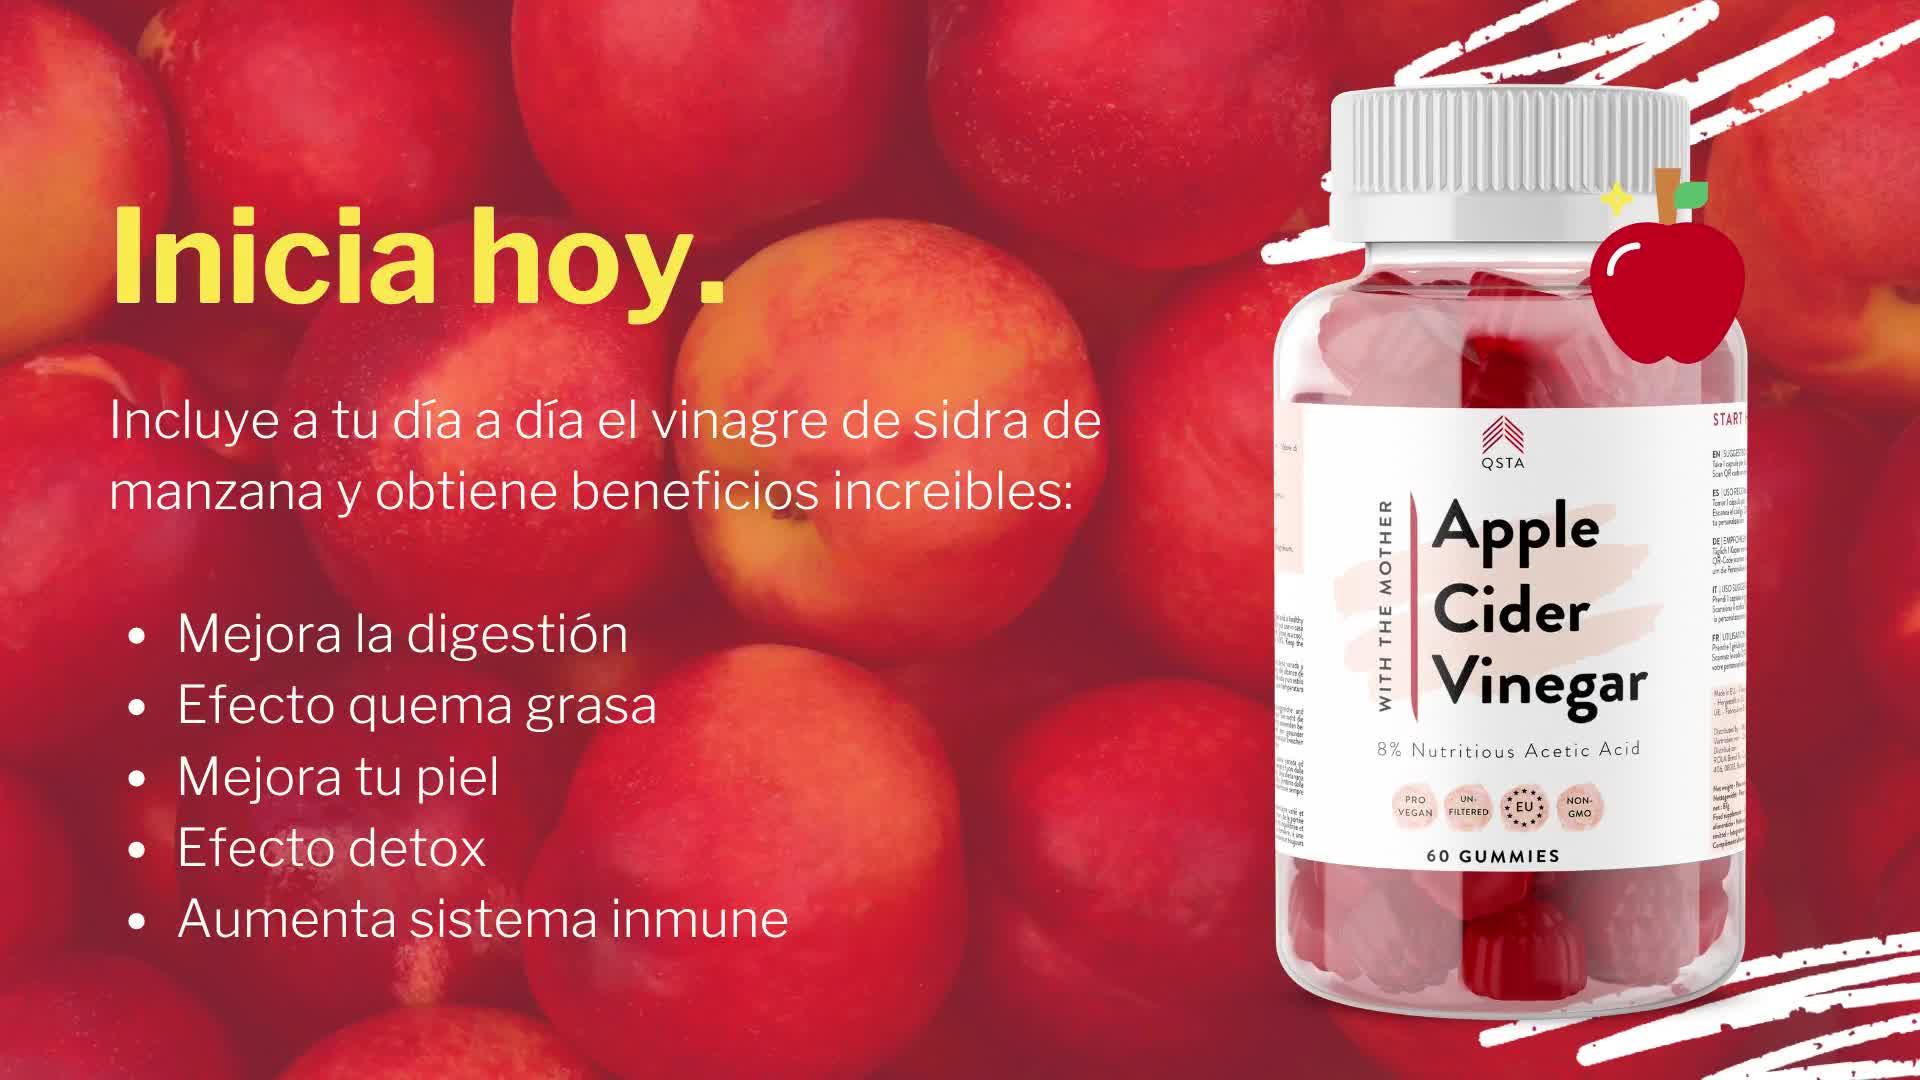 Vinagre de Sidra de Manzana (60 GUMMIES) + FIBRA PREBIOTICA + CERO CARBS NETOS, SIN AZÚCARES AÑADIDOS, SIN EDULCORANTES, VEGANO (Pectina) + B6 + B12 + ...